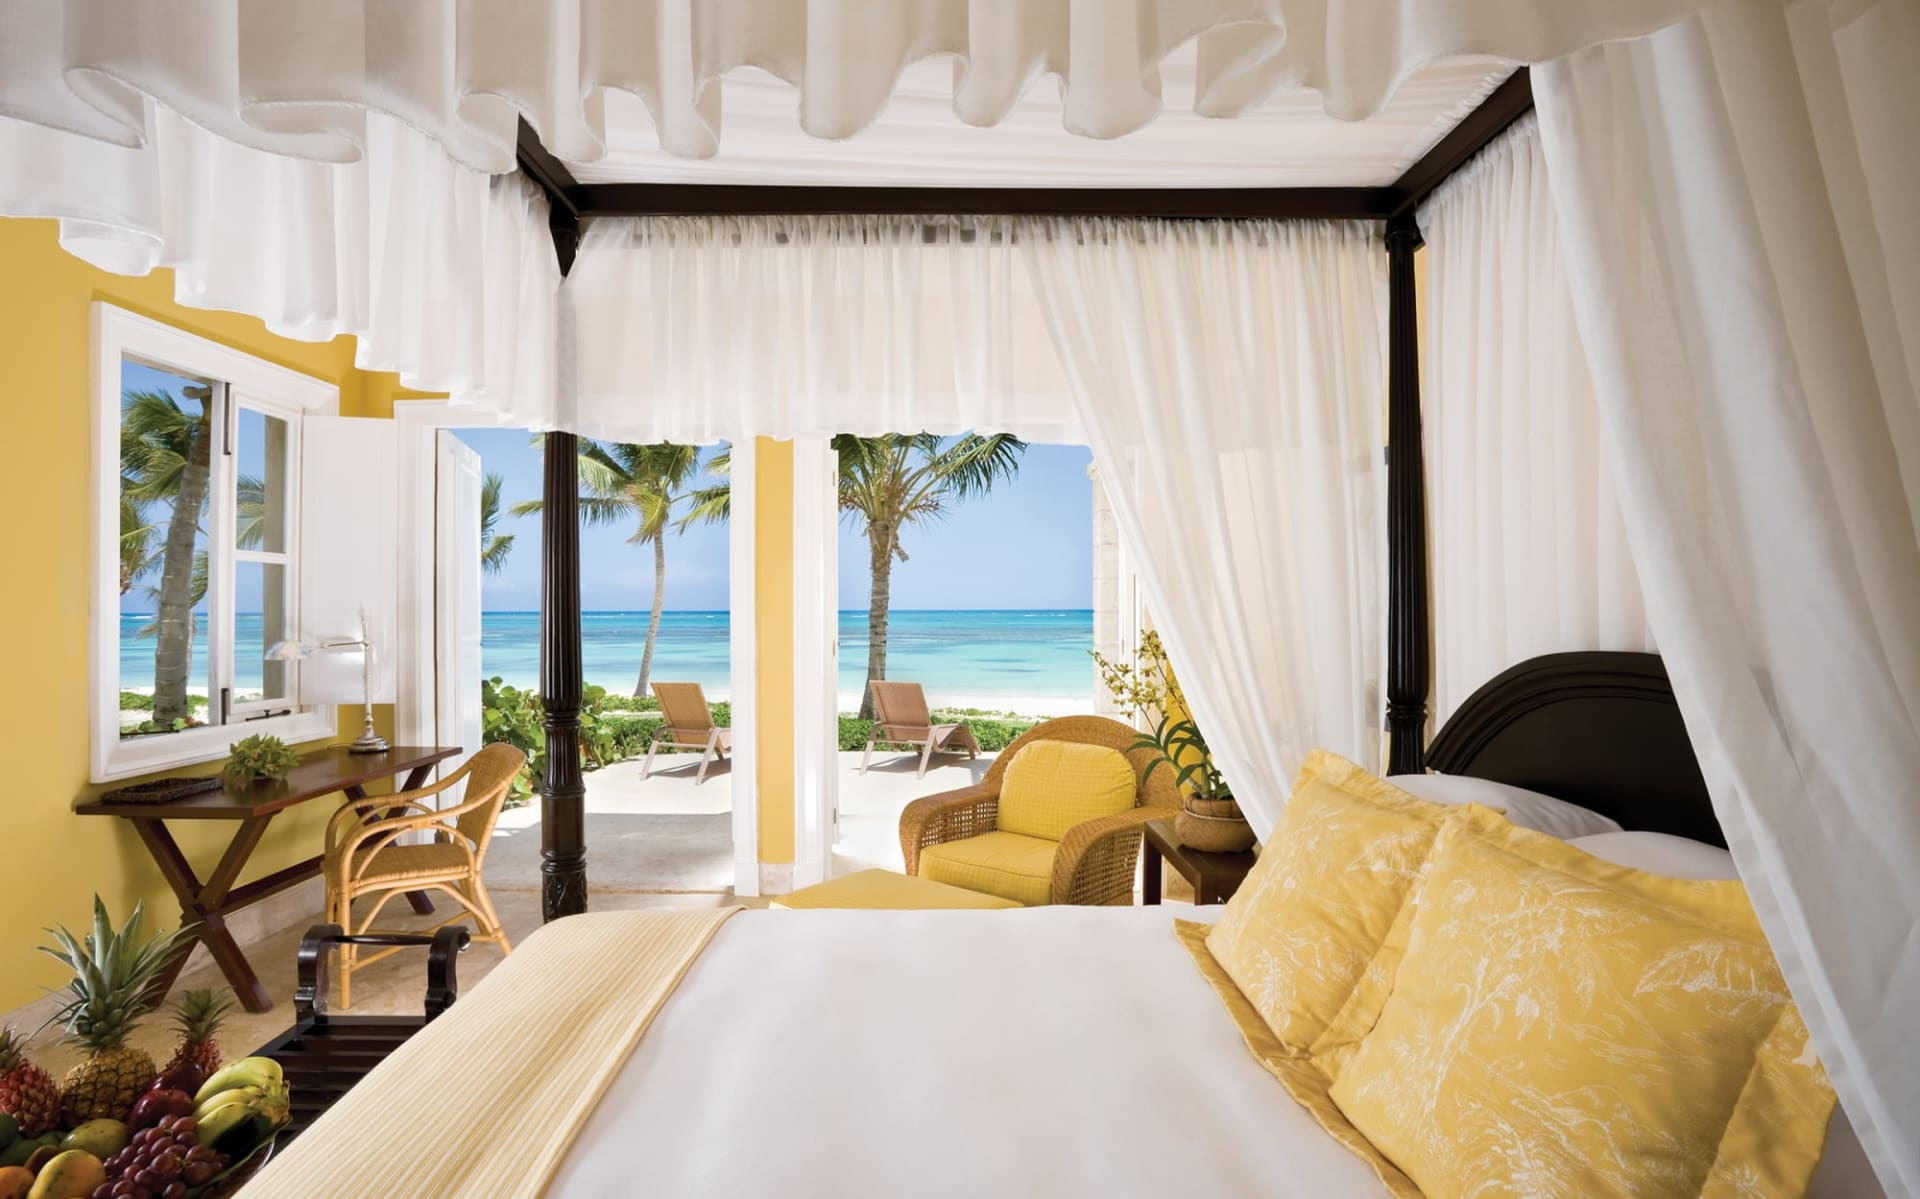 Tortuga Bay Hotel in Punta Cana:  Tortuga Bay Hotel - Hotelzimmer